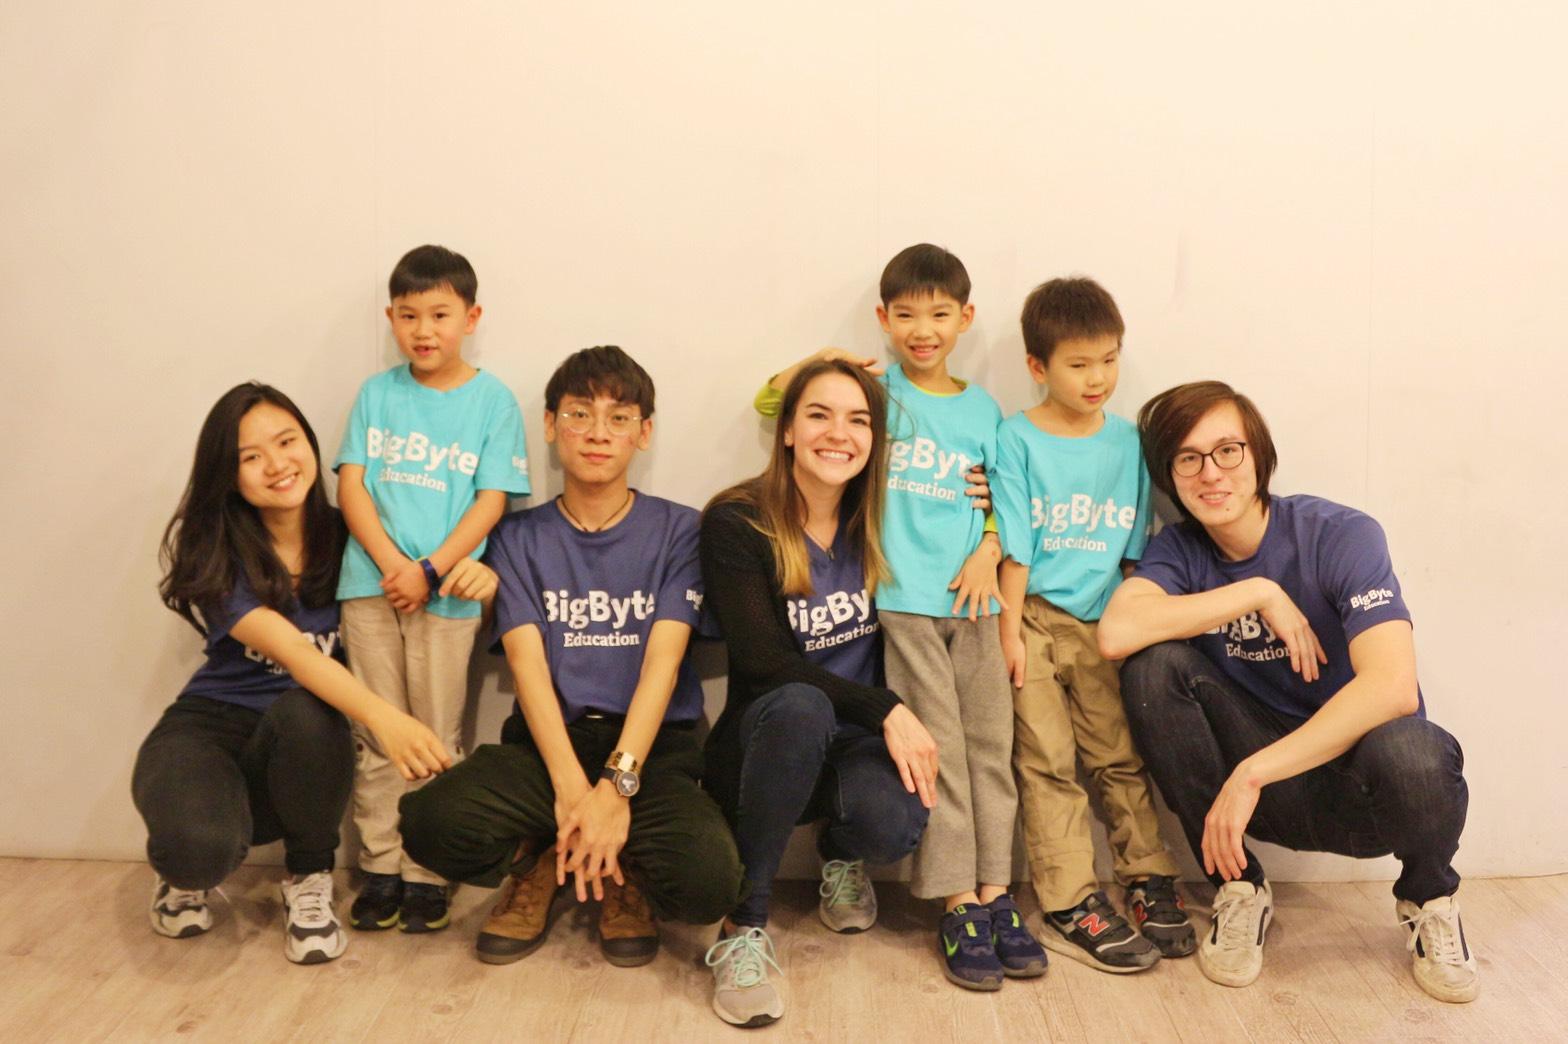 Teaching English and Living in Taiwan Jobs Available 教學工作, BigByte Education BigByte Education | 2021 Full-year Educator Position Available! image